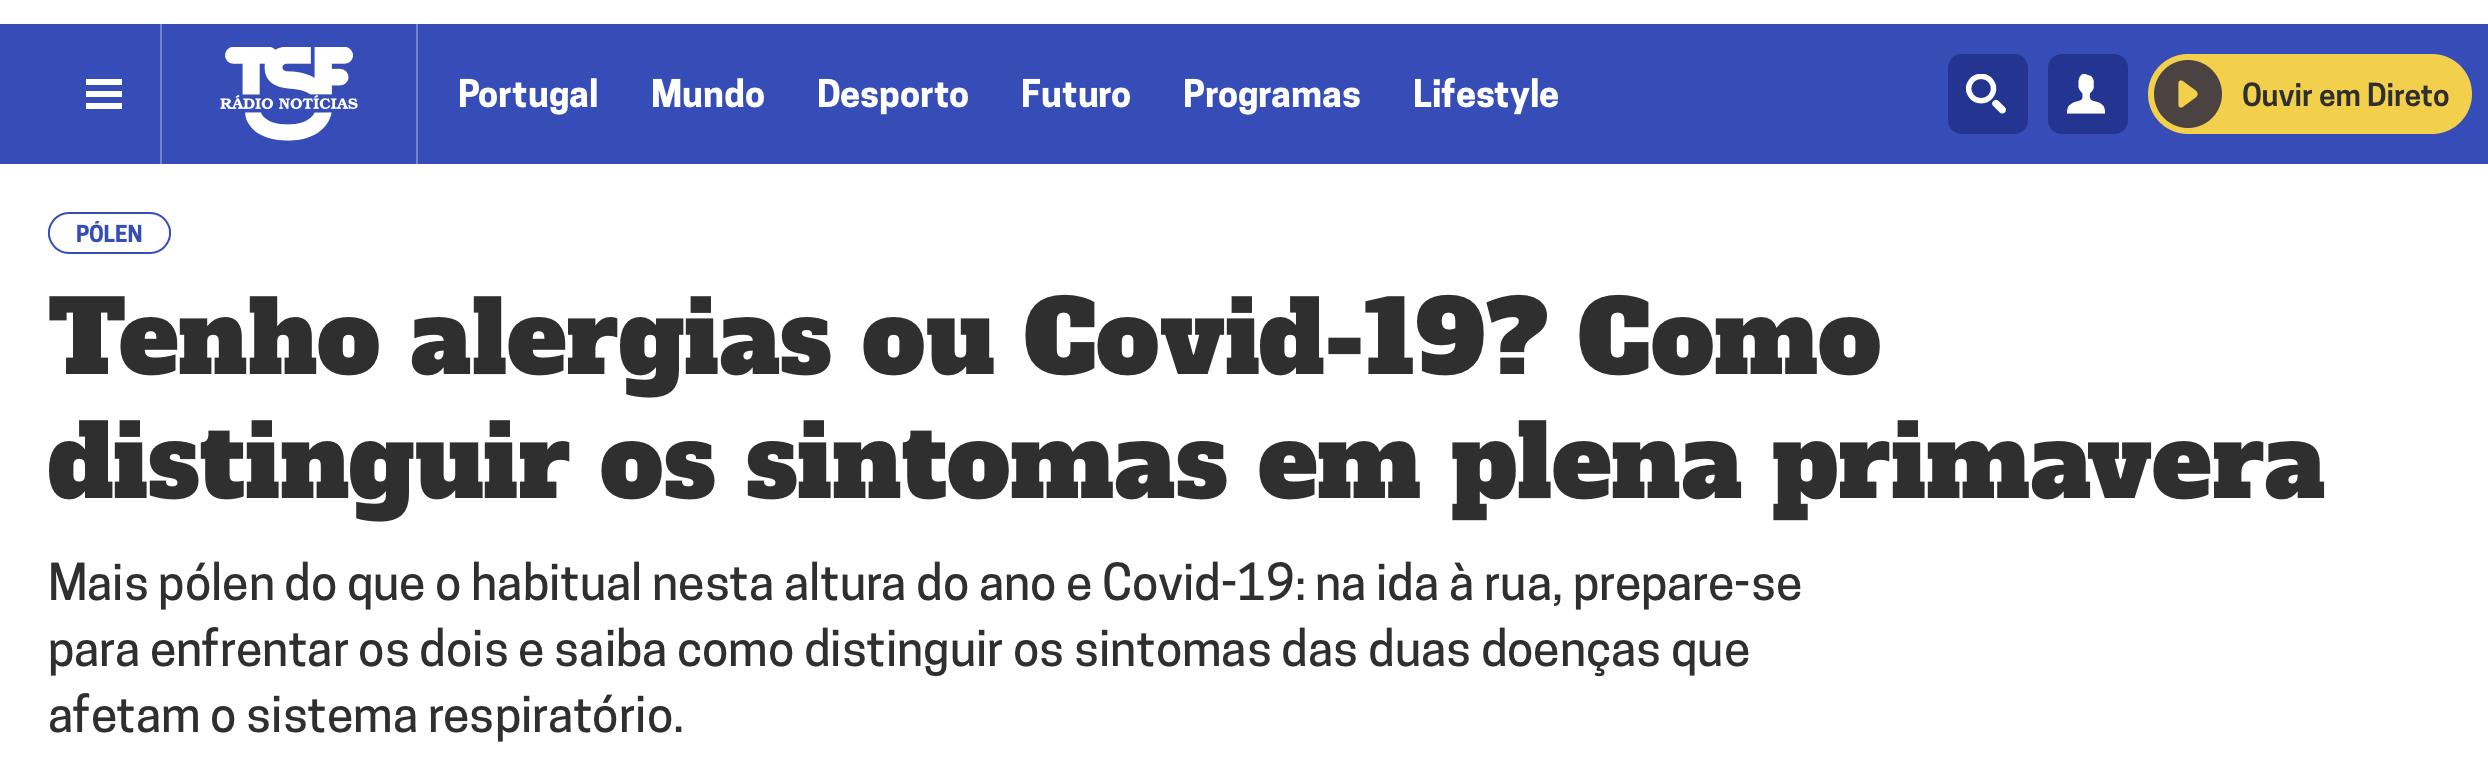 TSF: Tenho alergias ou Covid-19  14/04/20